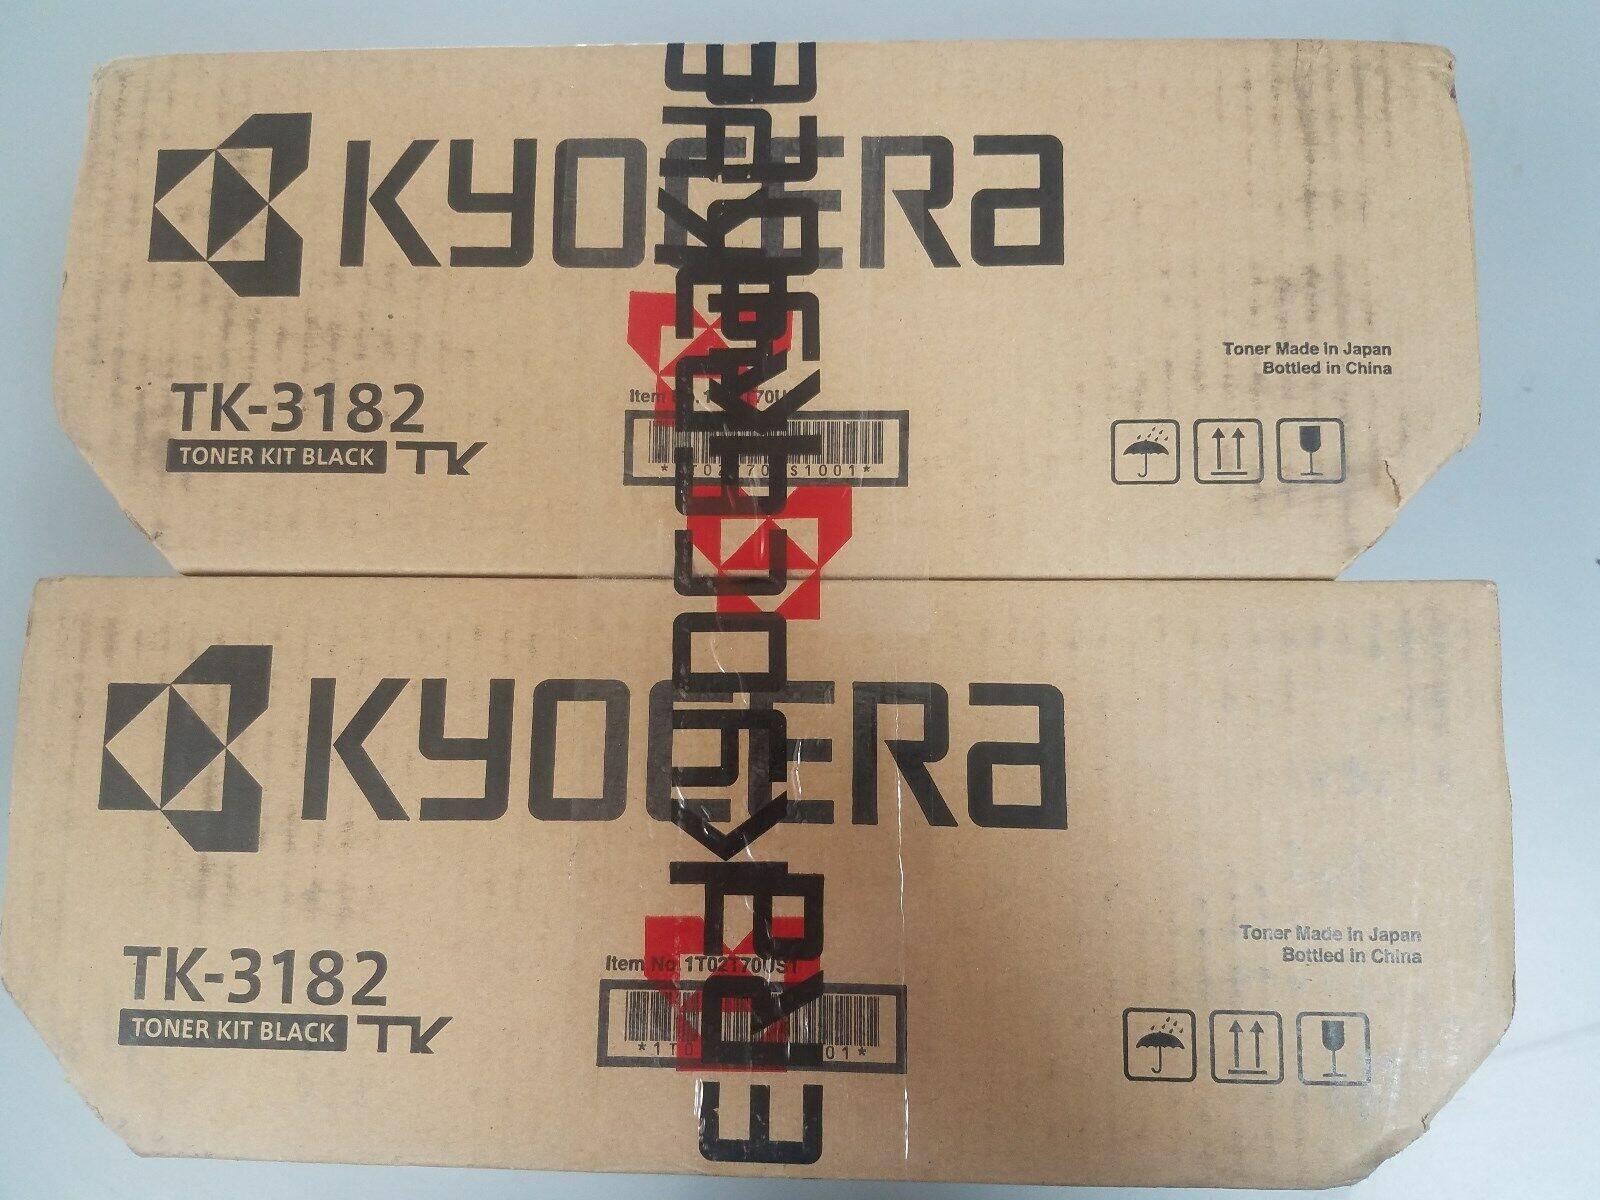 Kyocera TK-3182 Toner Cartridge Black